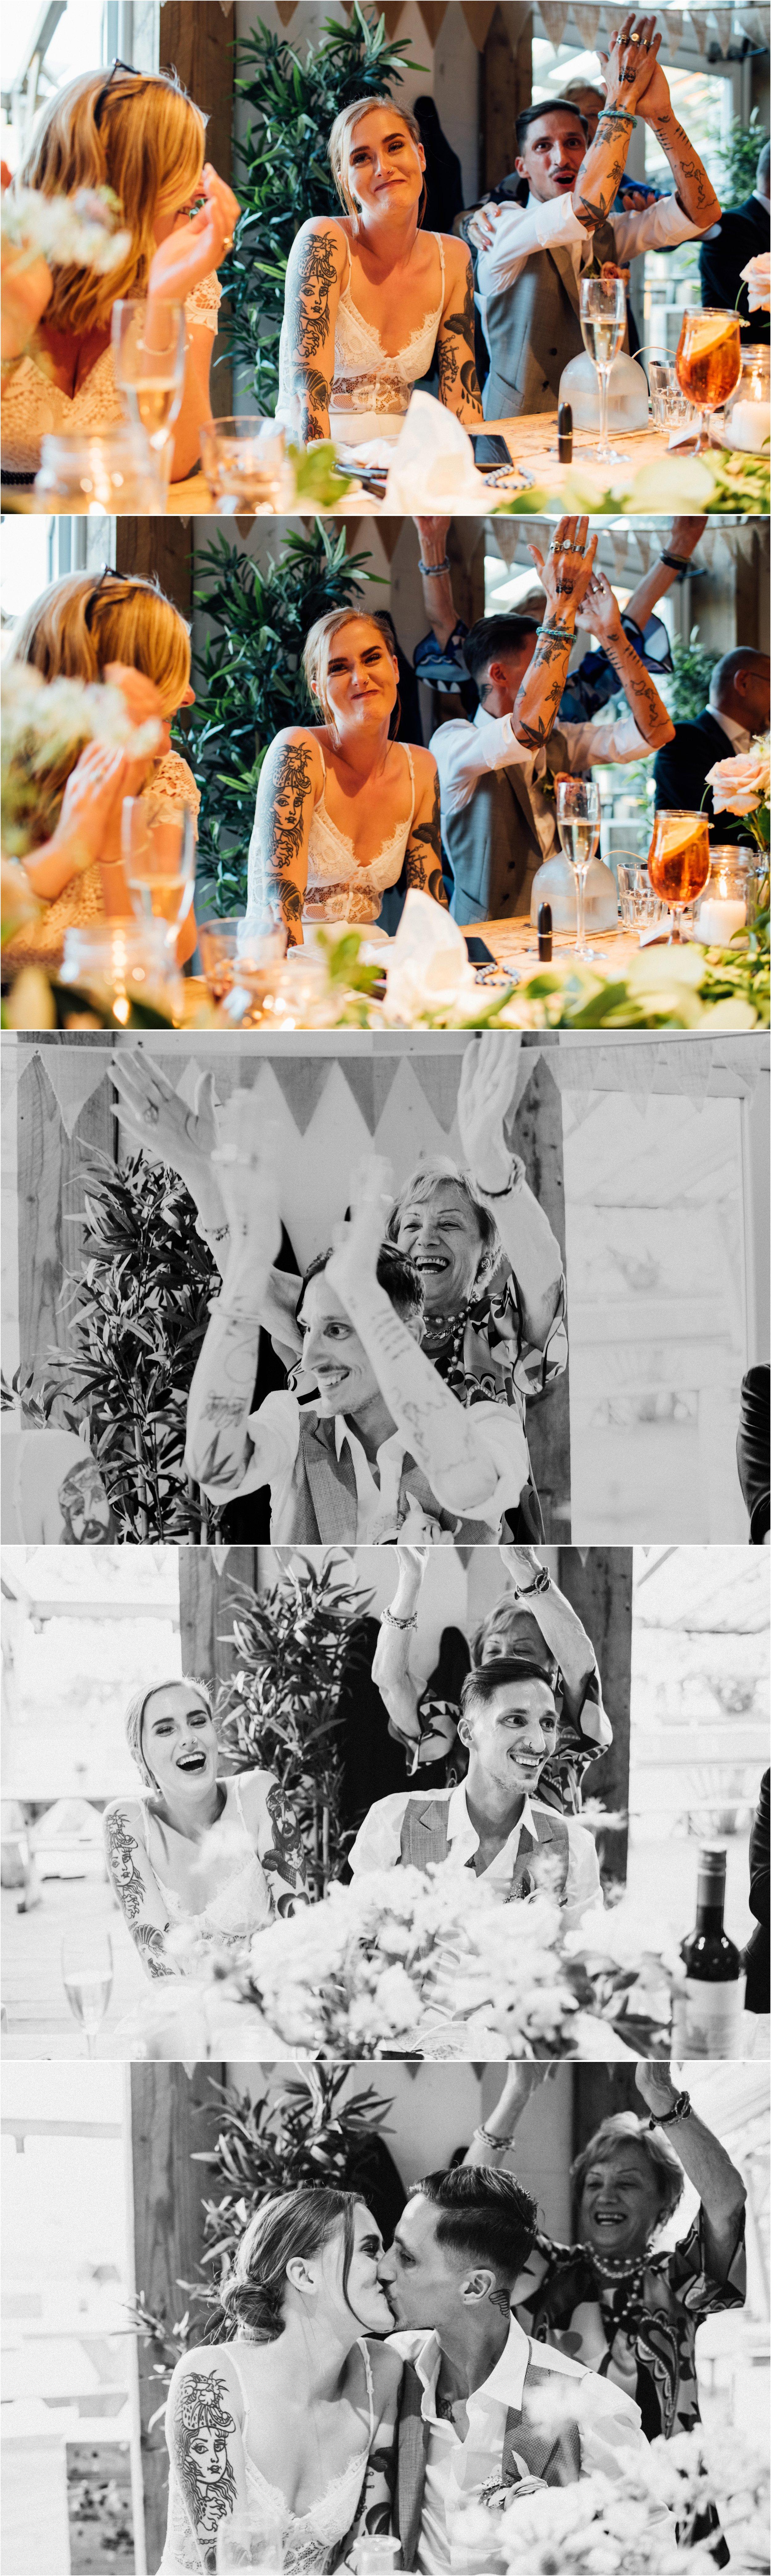 Hackney town hall wedding photography_0217.jpg